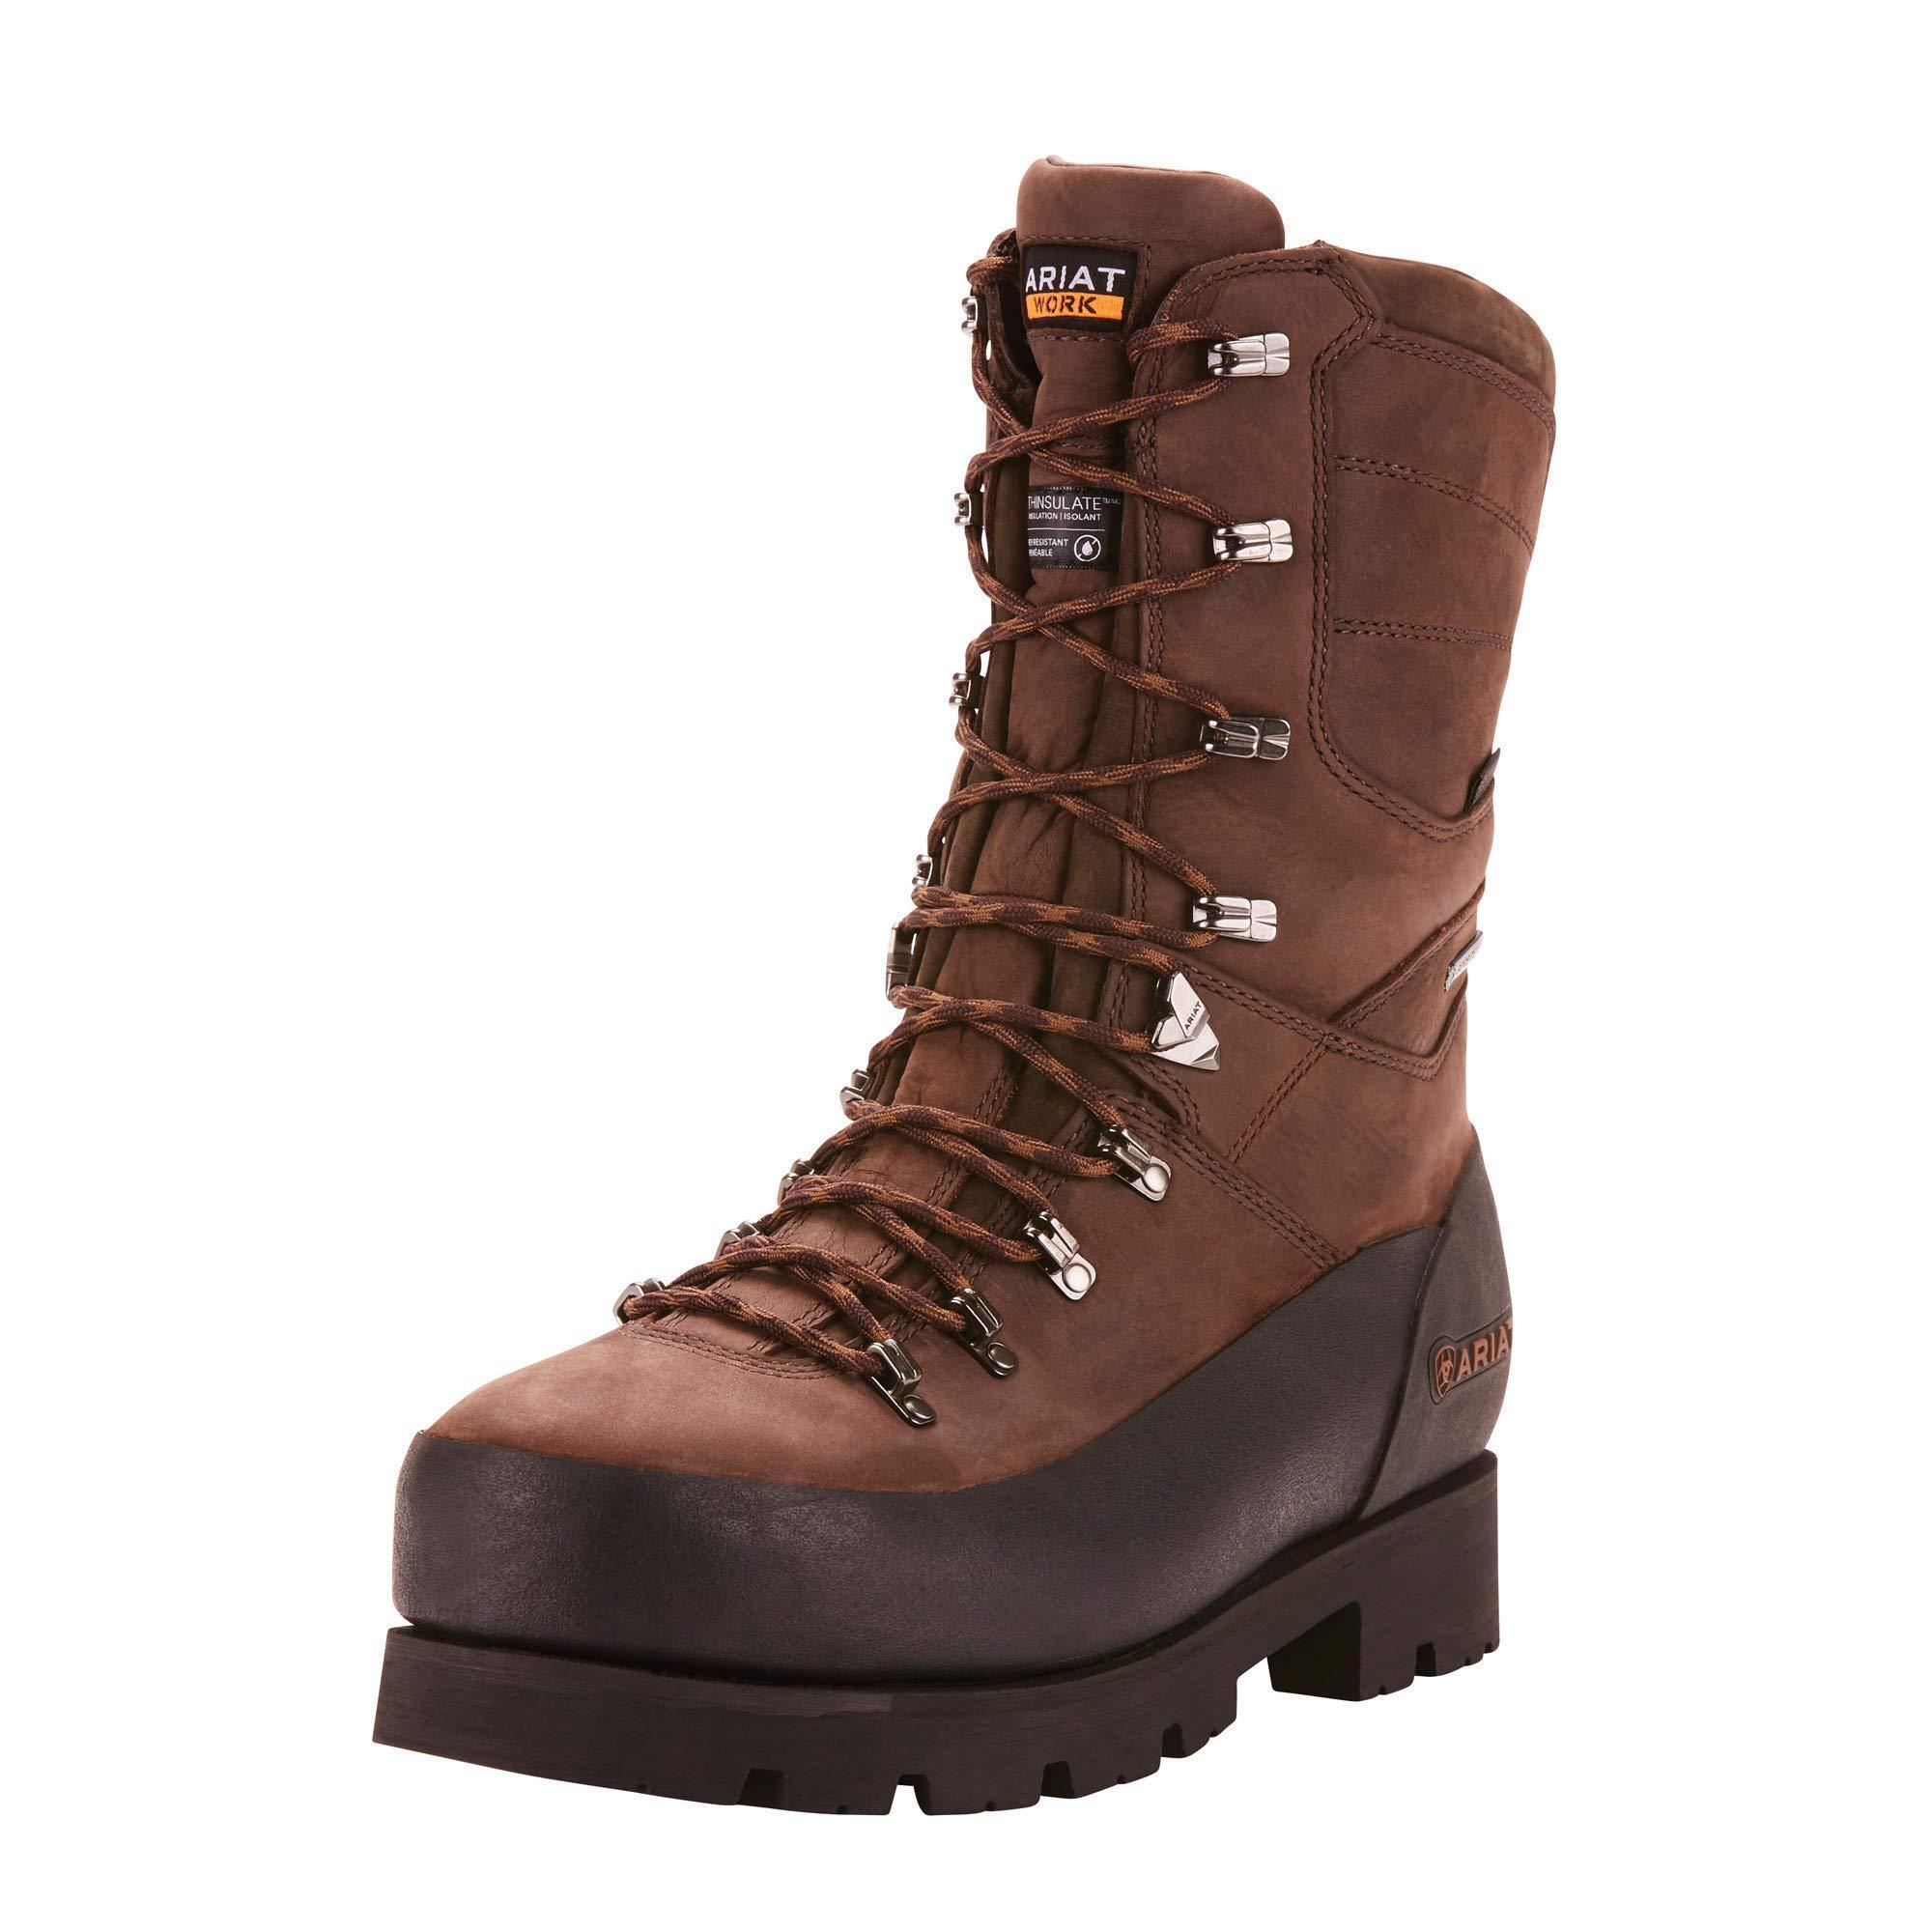 Ariat Work Men's LINESMAN 10'' GTX 400G Composite Toe Boot, bitter brown, 7.5 D US by ARIAT